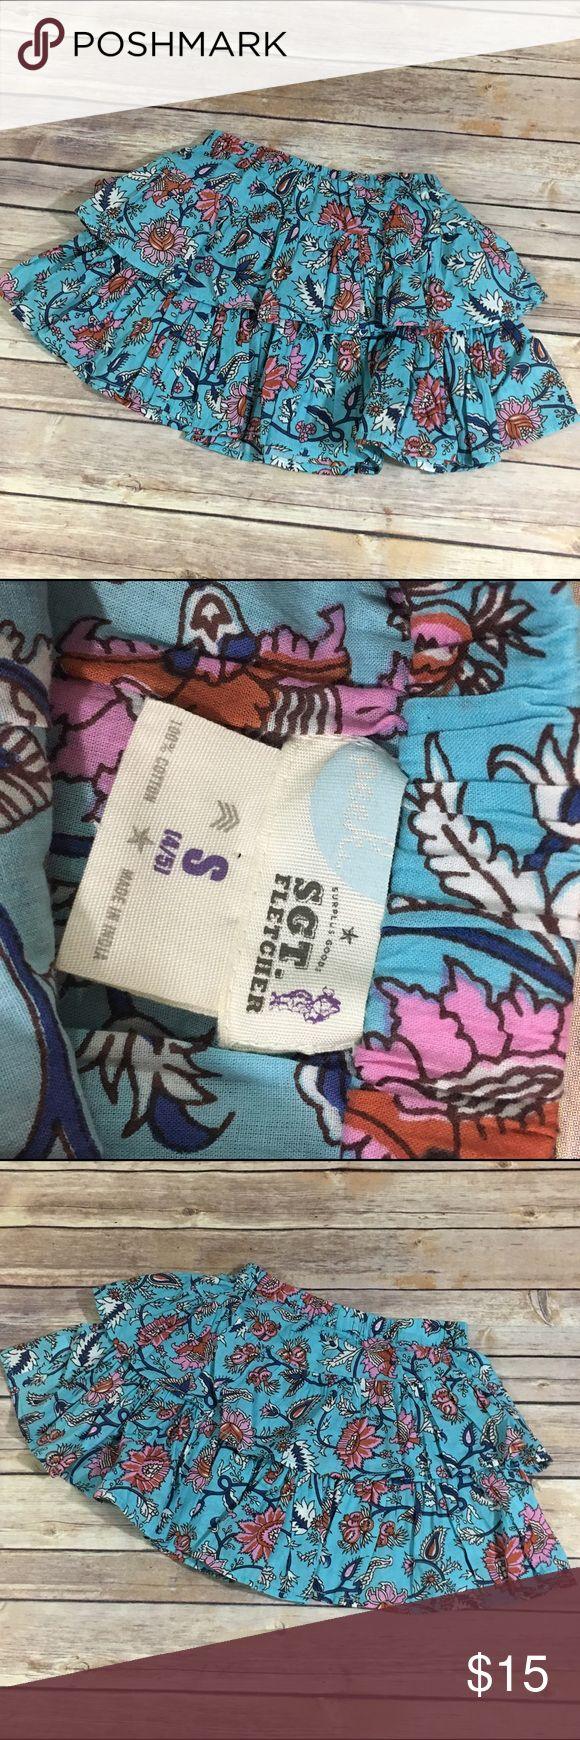 Peek Sgt. Fletcher Blue Tiered Skirt 4/5 Peek Sgt. Fletcher Blue Tiered Skirt 4/5  Beautiful floral print tiered skirt from Peek Sgt. Fletcher.  Lined.  Elastc waist.  #blue #floral #tiered #skirt #itsaskirt #sgtfletcher #peek Peek Bottoms Skirts